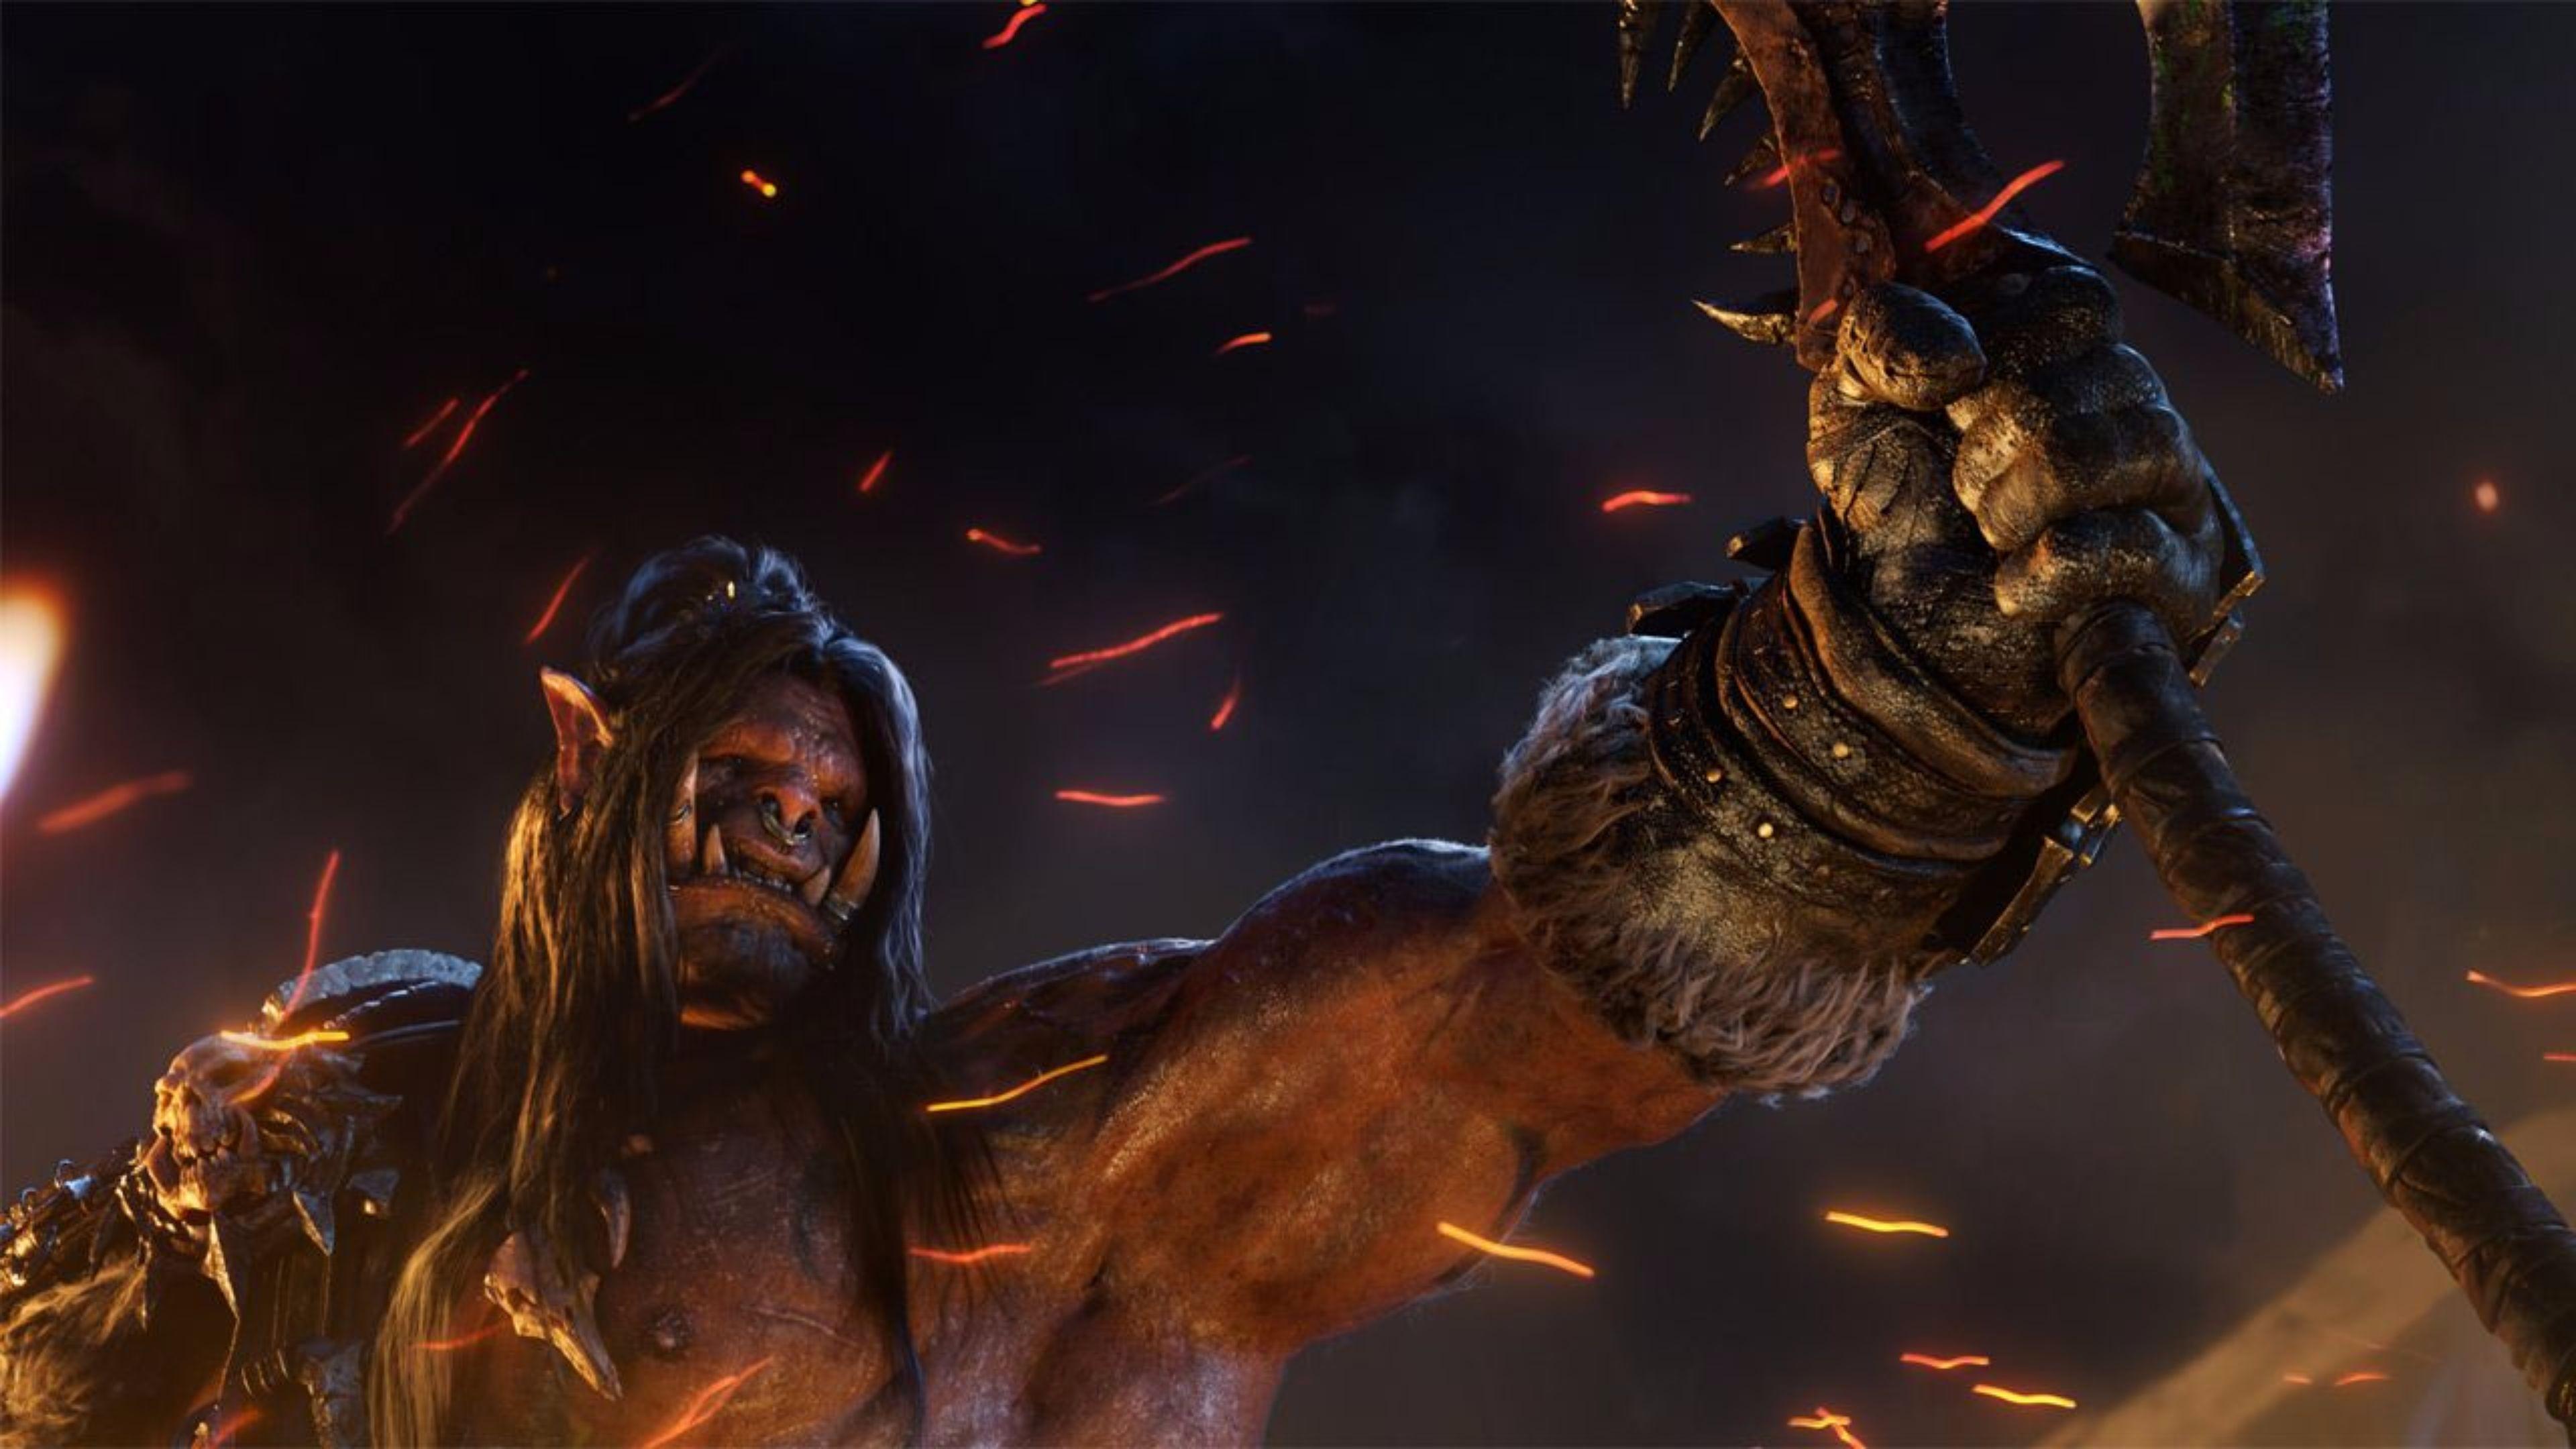 World Of Warcraft 4k Wallpaper: Warcraft Movie Wallpapers